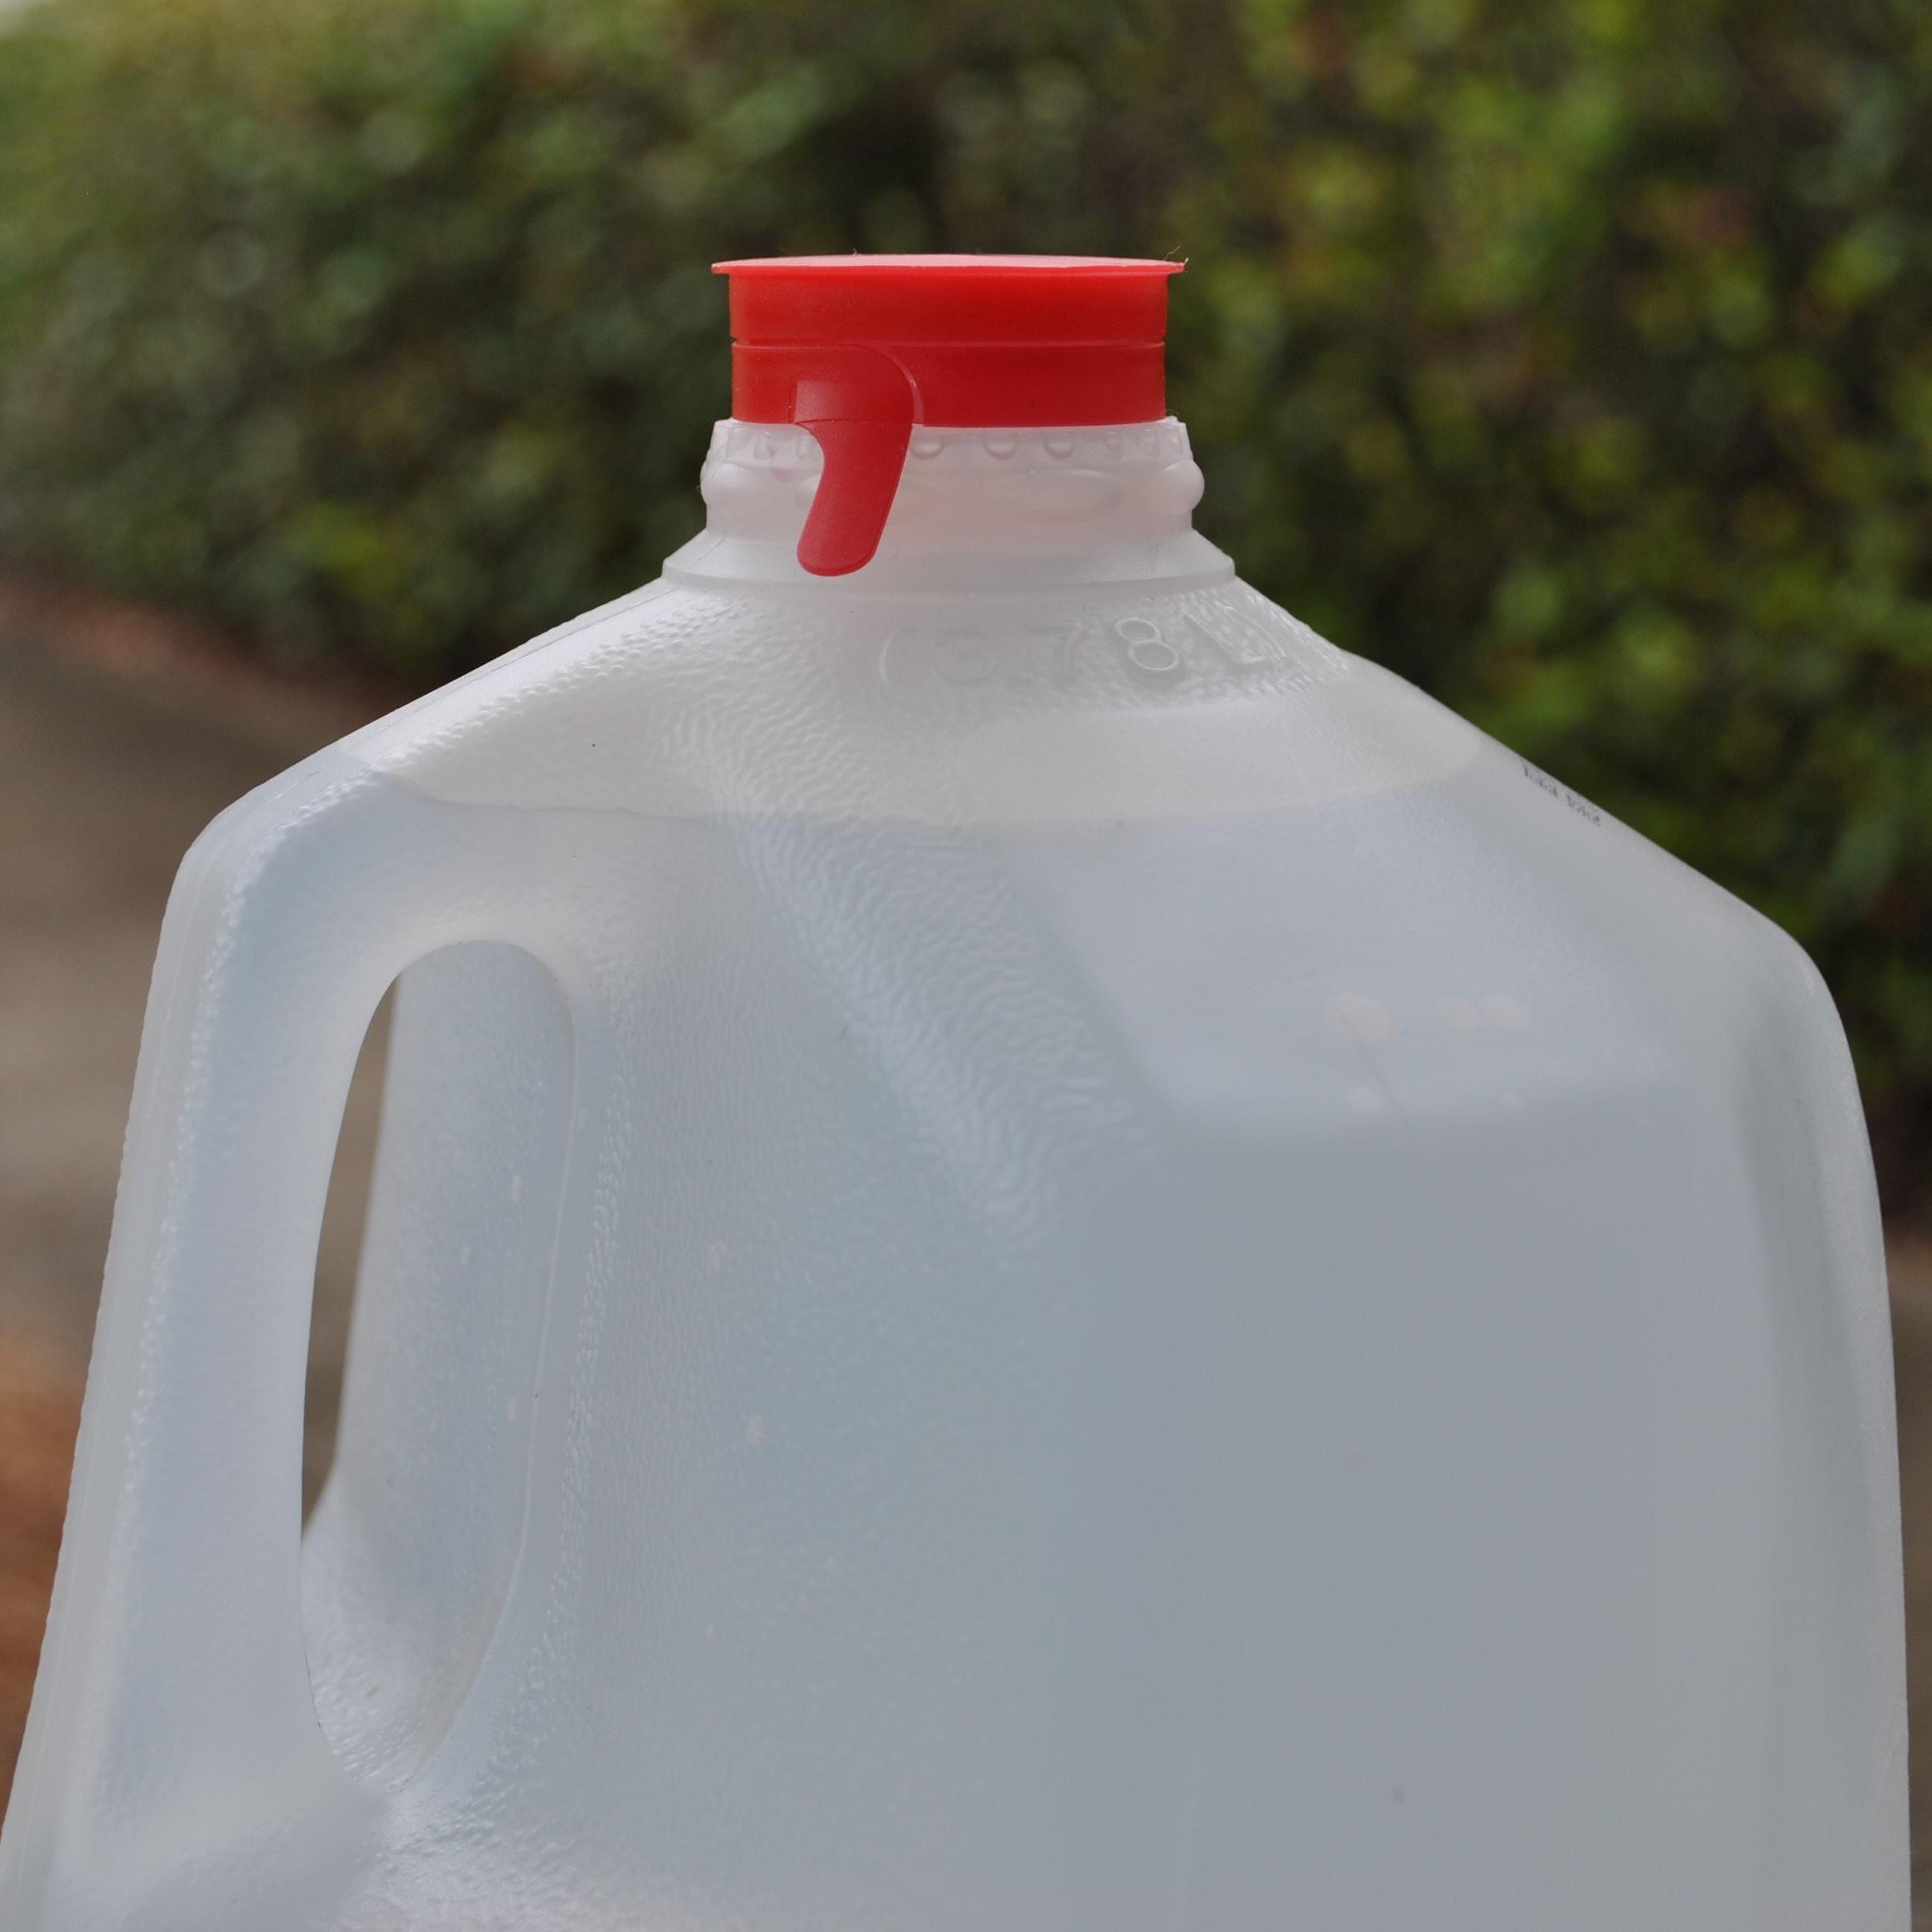 emergency water supply